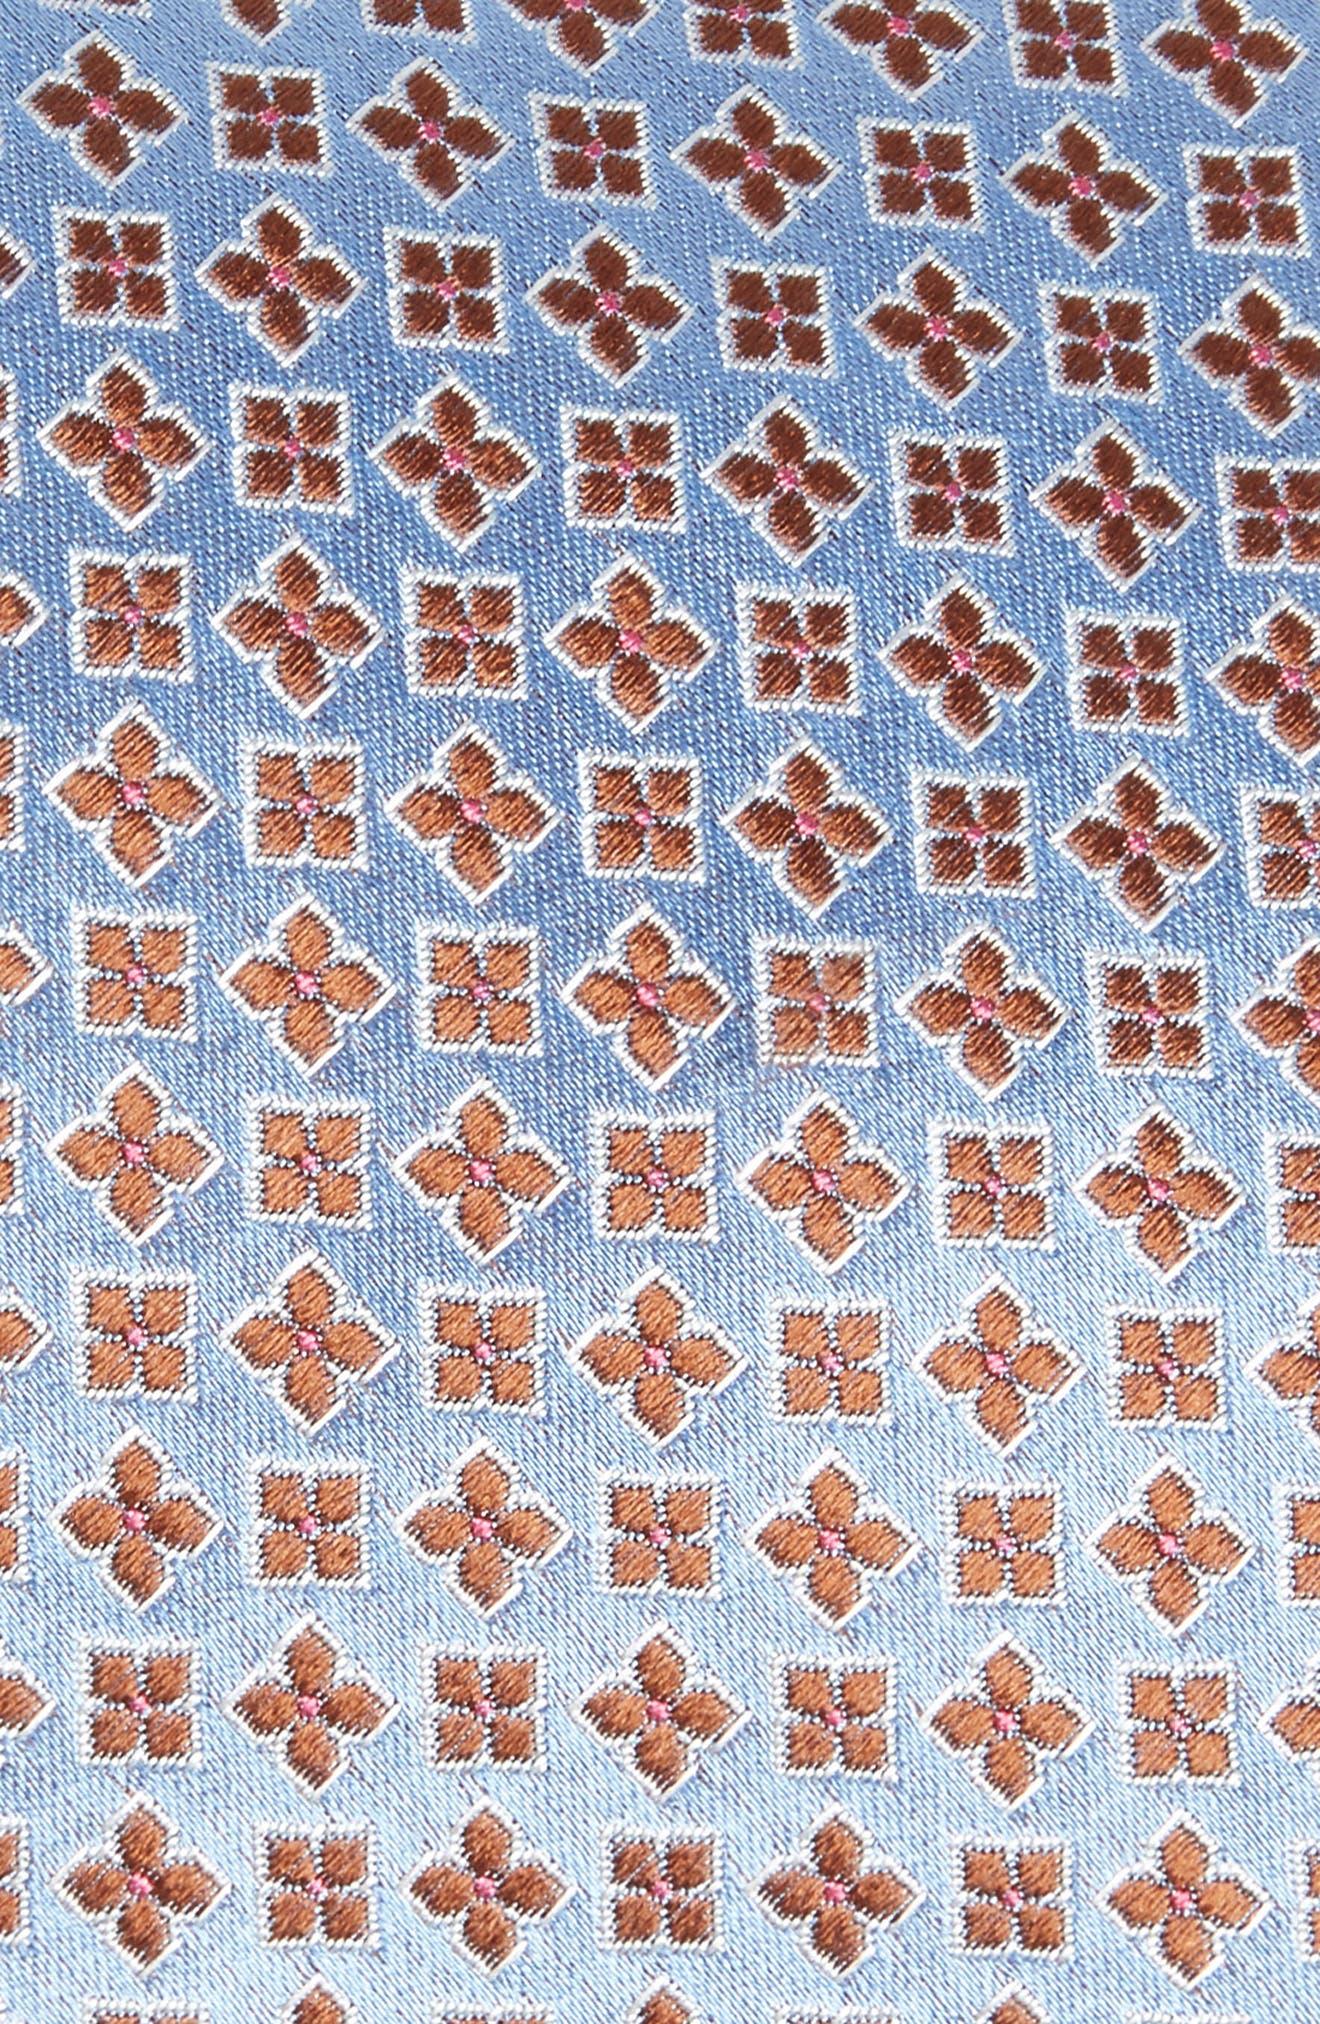 Neat Floral Silk Tie,                             Alternate thumbnail 2, color,                             400